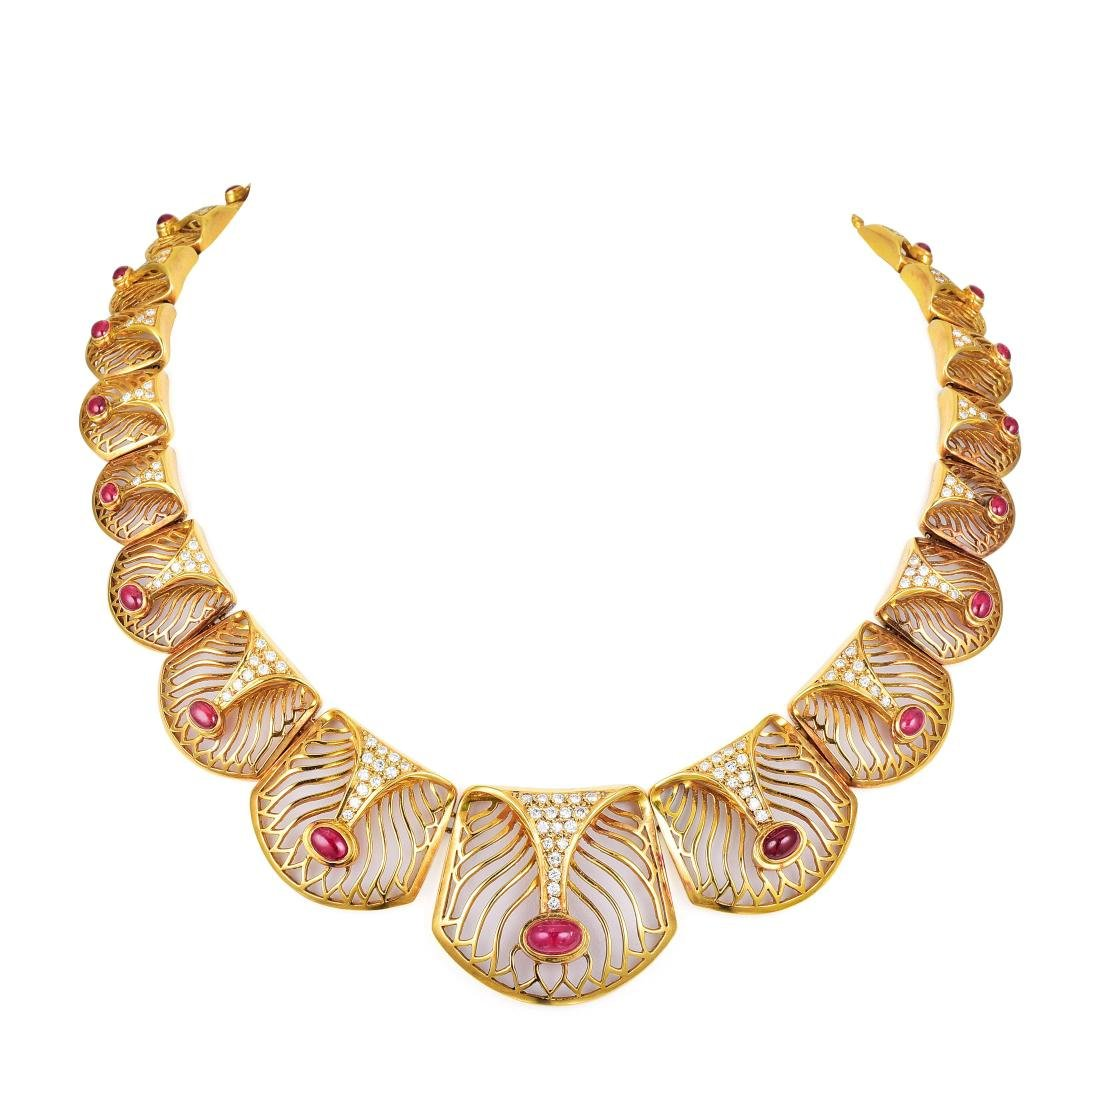 Ilias Lalaounis Ruby and Diamond Necklace